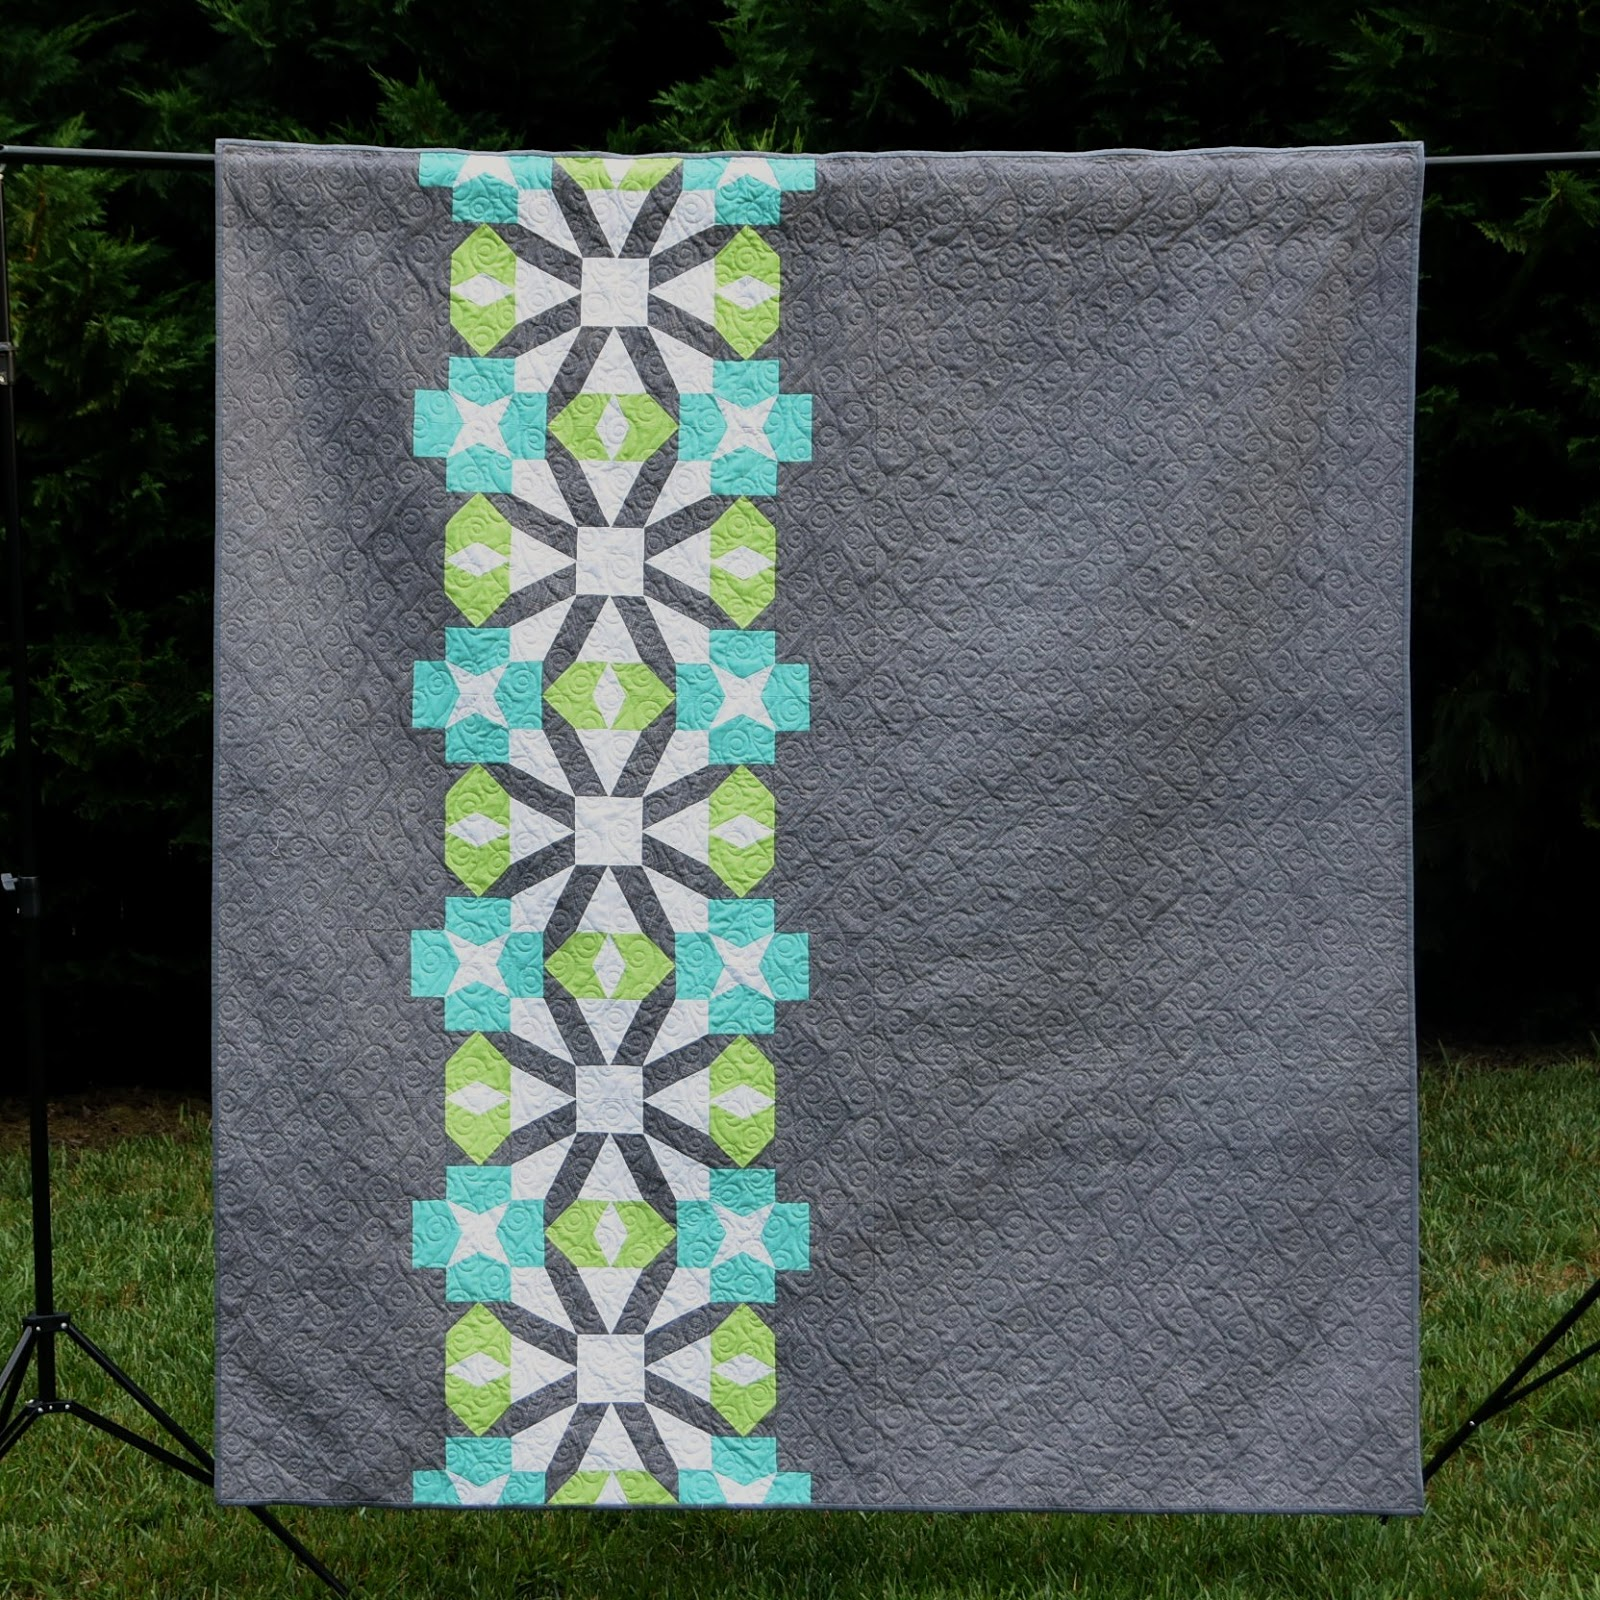 Meadow Mist Designs: Kiku Quilt in Quilts from 100 Blocks : quilting today magazine - Adamdwight.com